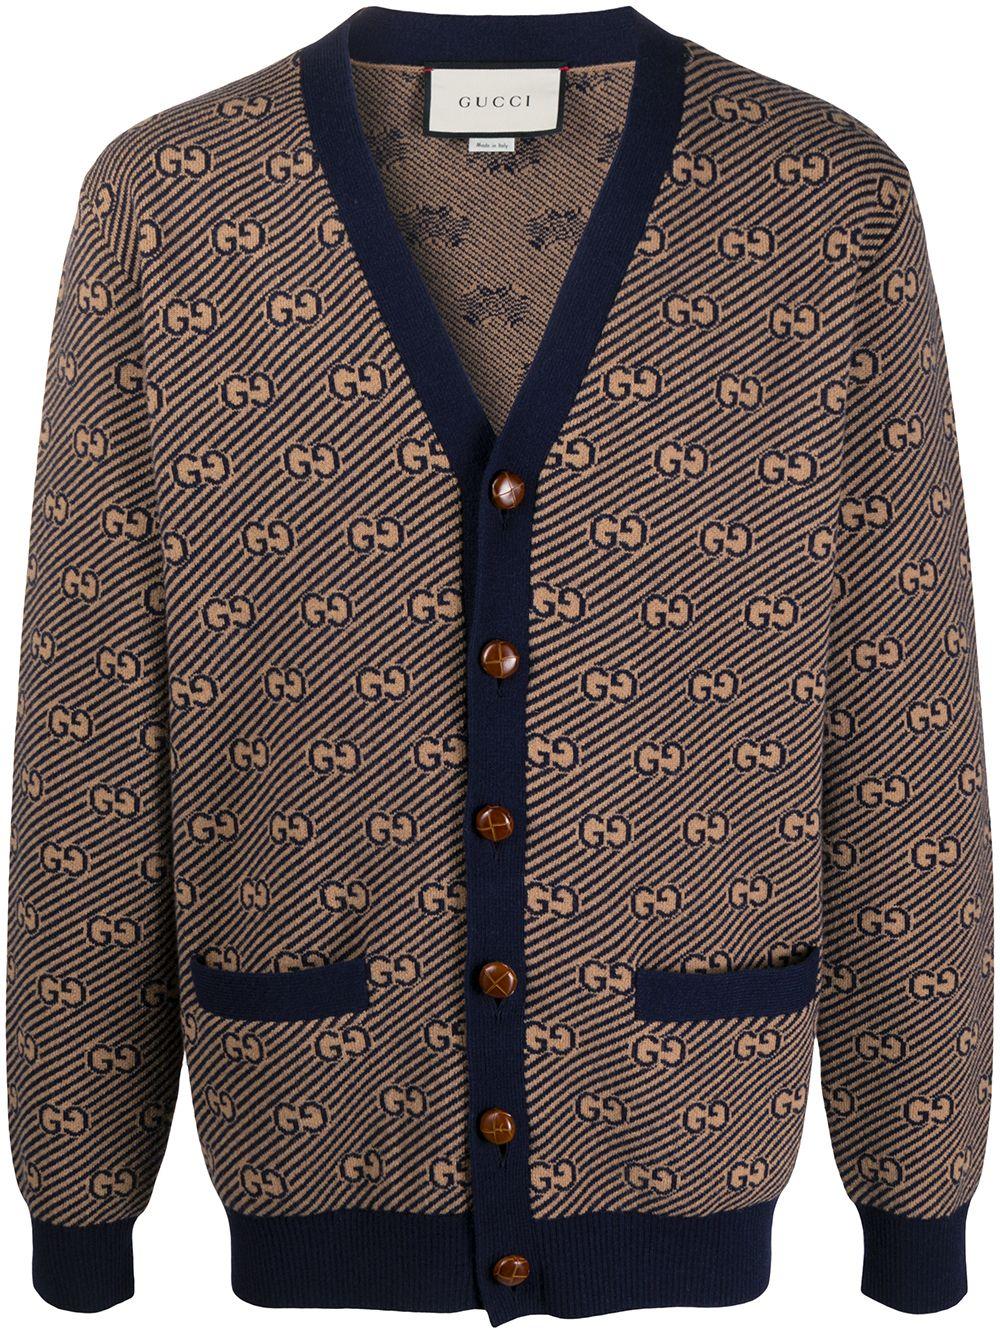 Oversized Wool Cardigan